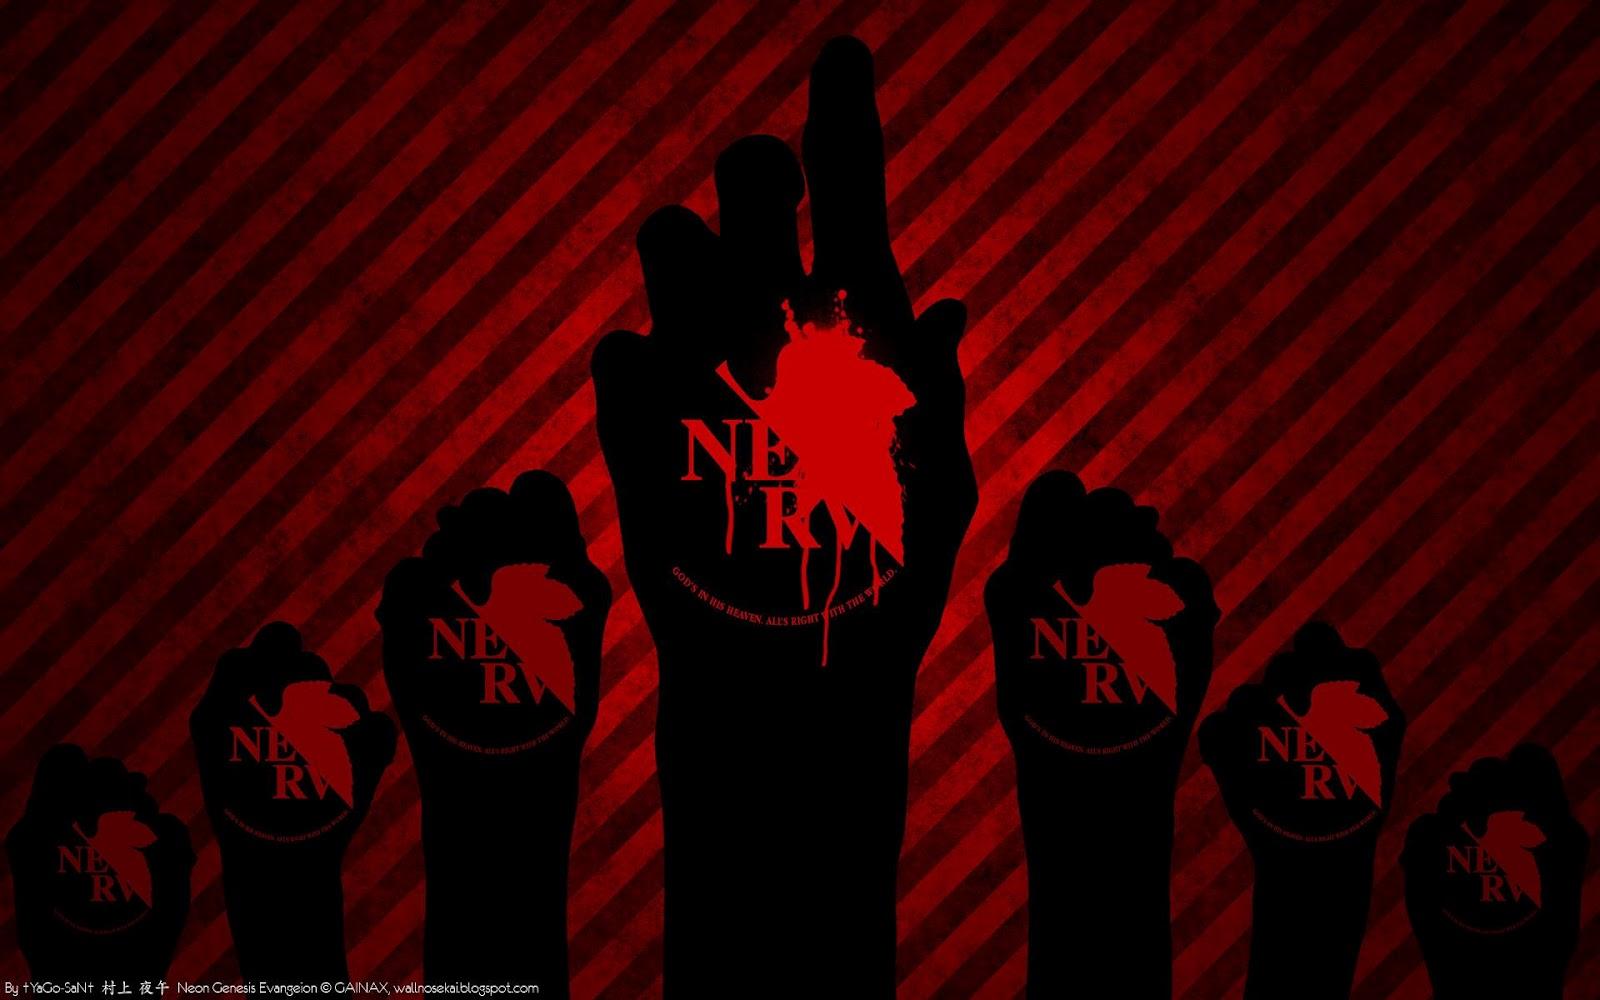 Killzone Shadow Fall Full Hd Wallpaper Wallpapers Hd Evangelion 70 Wallpapers Fondo De